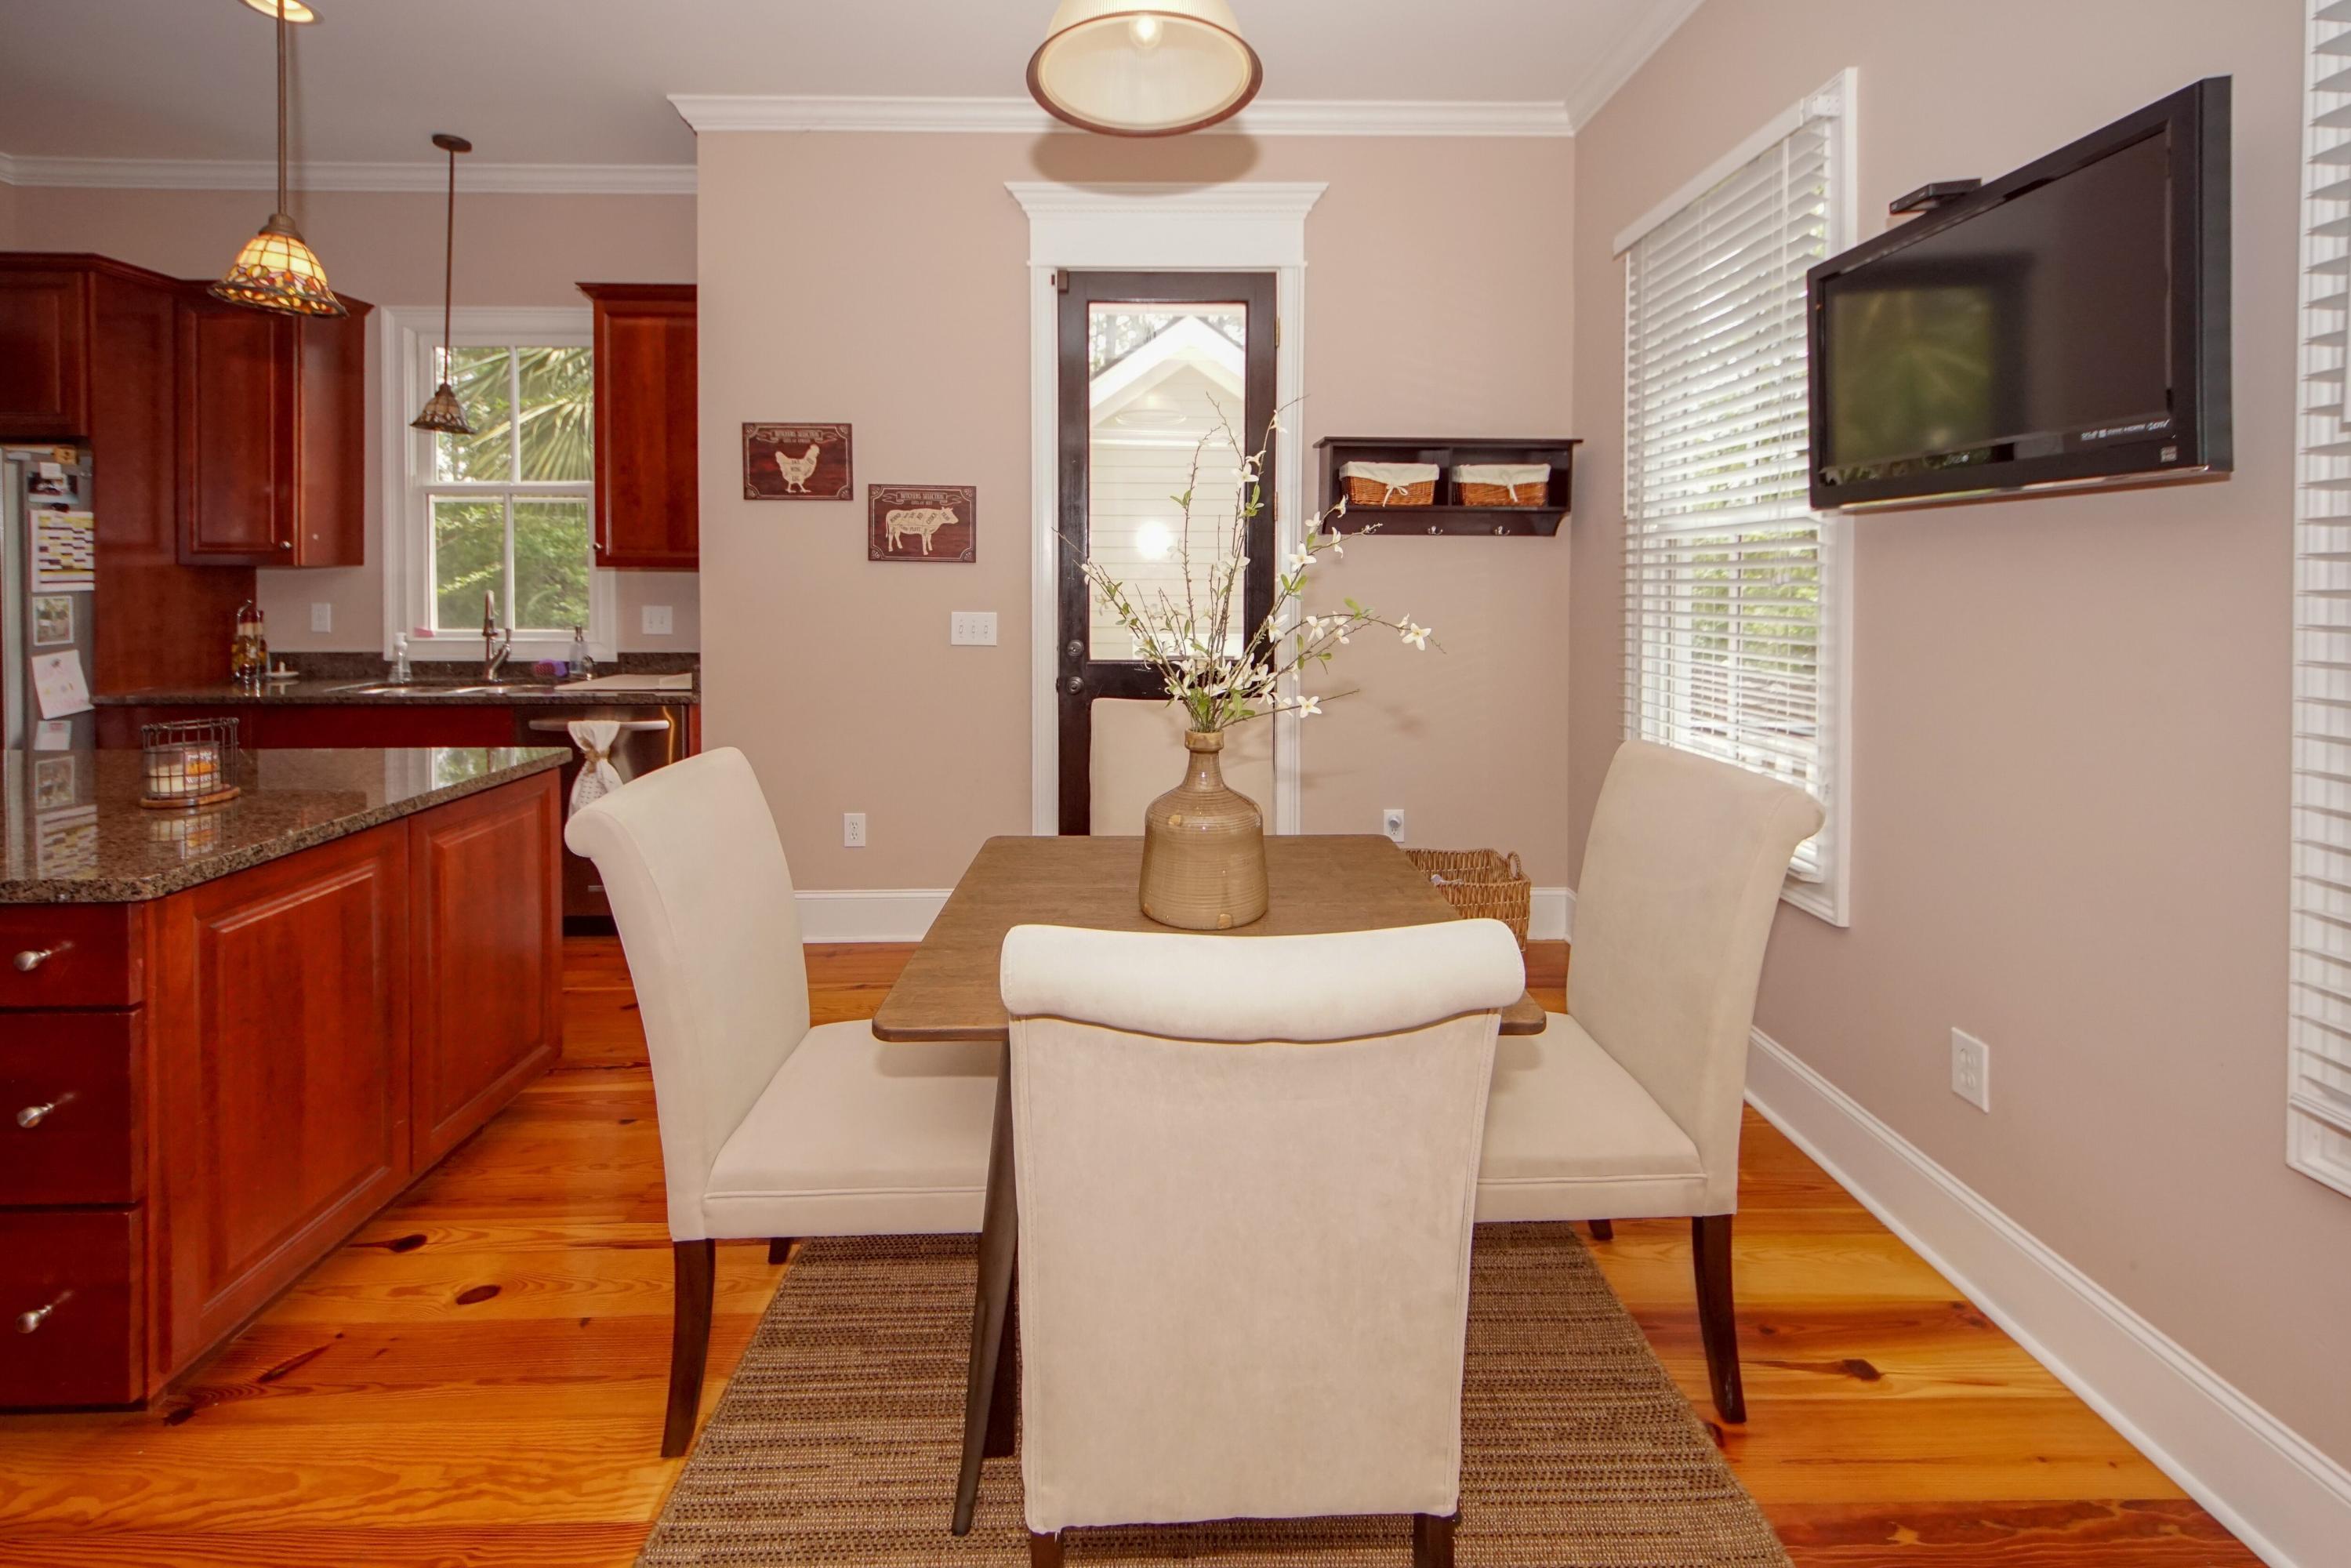 Grassy Creek Homes For Sale - 368 Tidal Terrace, Mount Pleasant, SC - 11